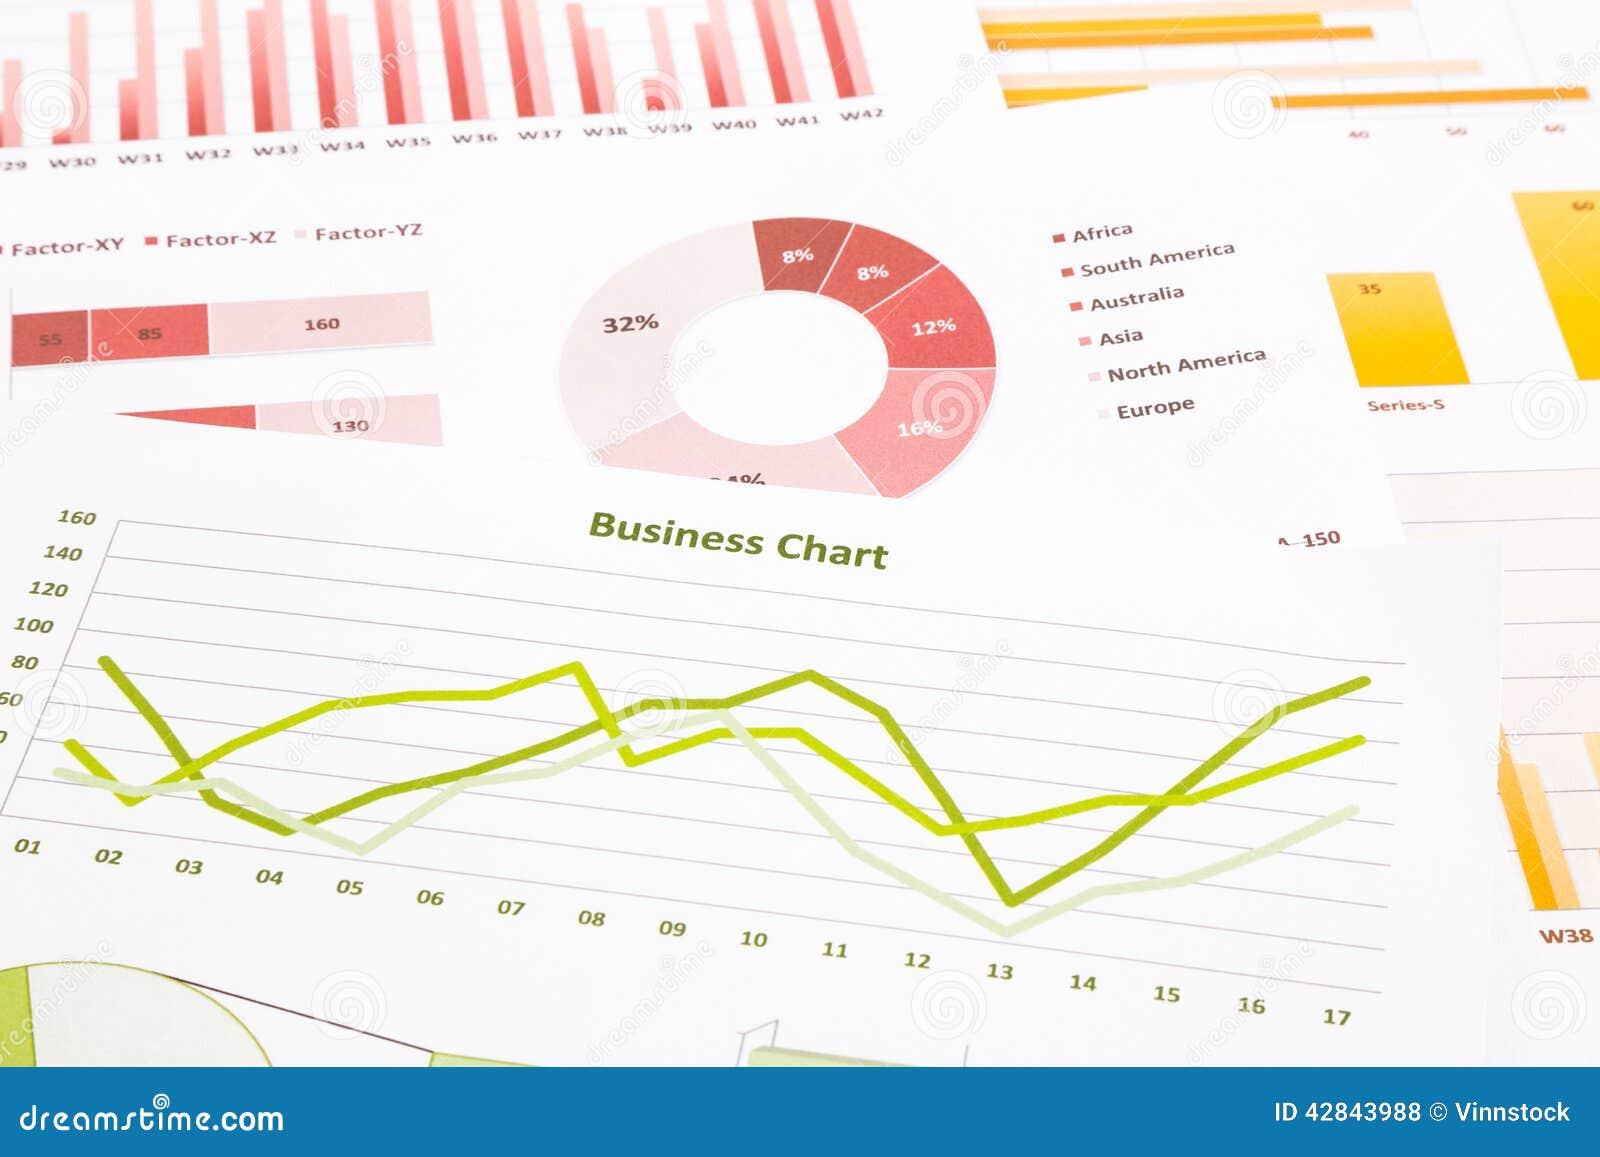 Cartas de negocio, análisis de datos, estudio de mercados, econo global